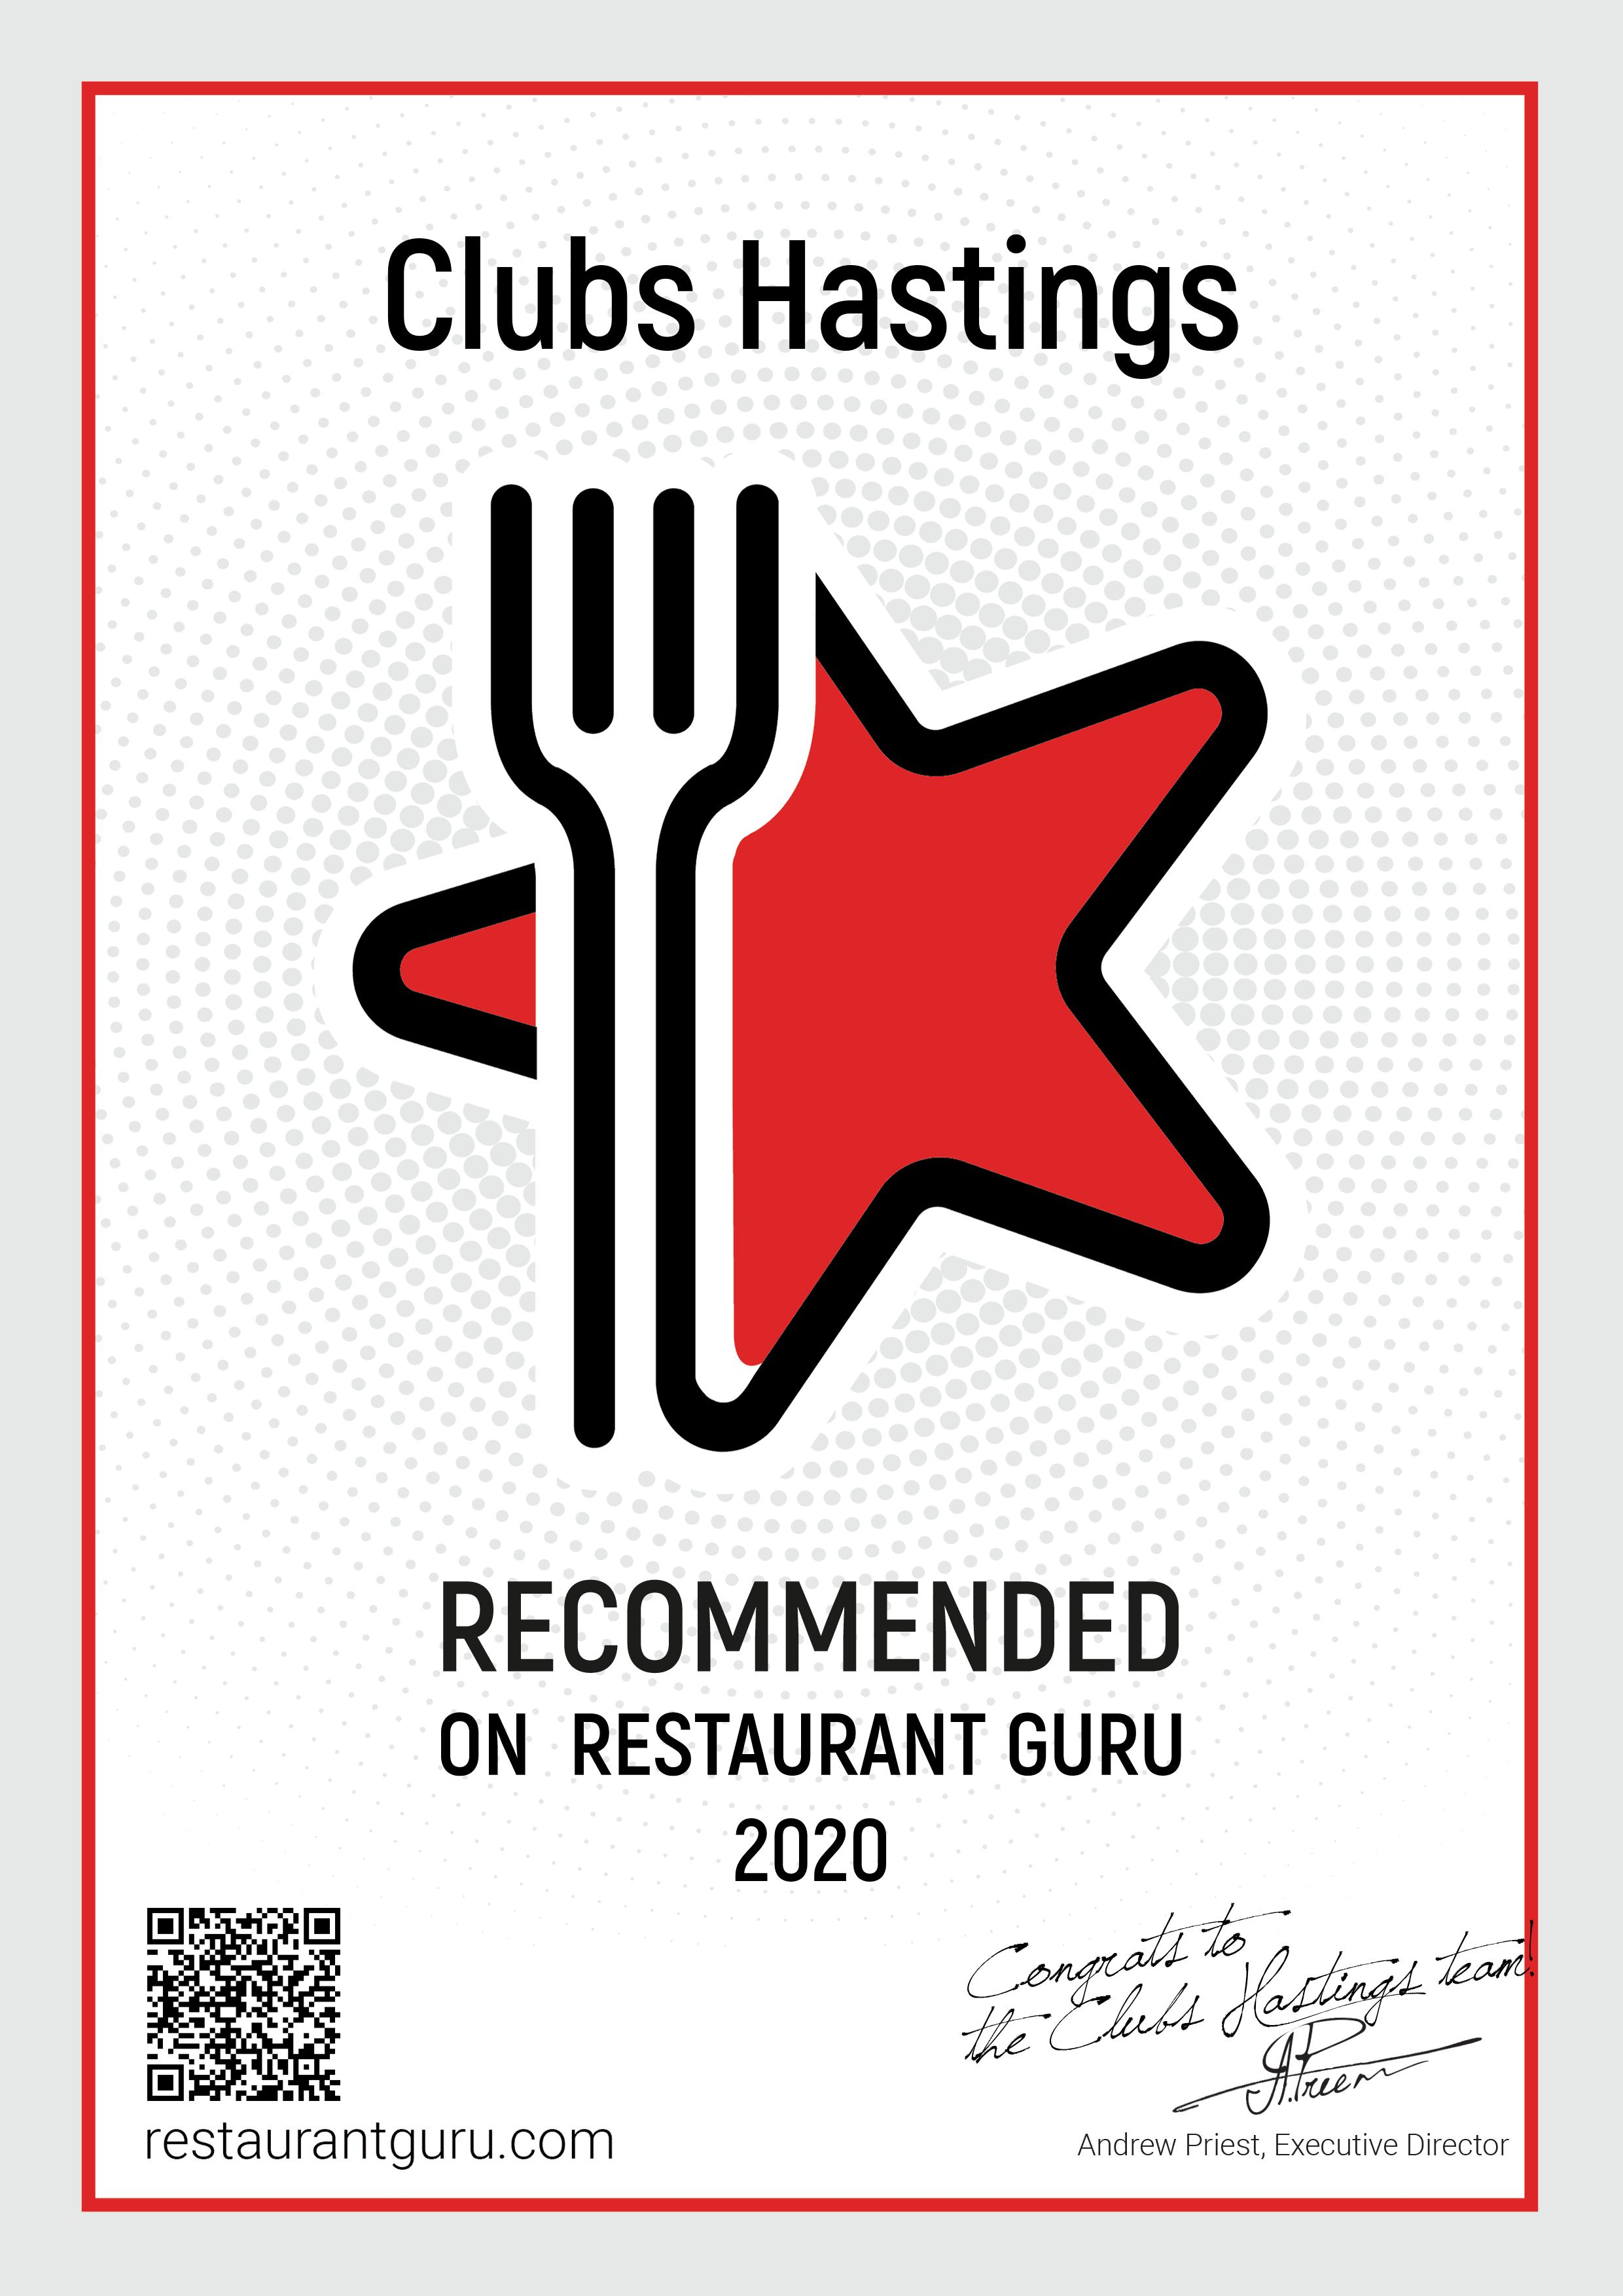 https://restaurantguru.com/